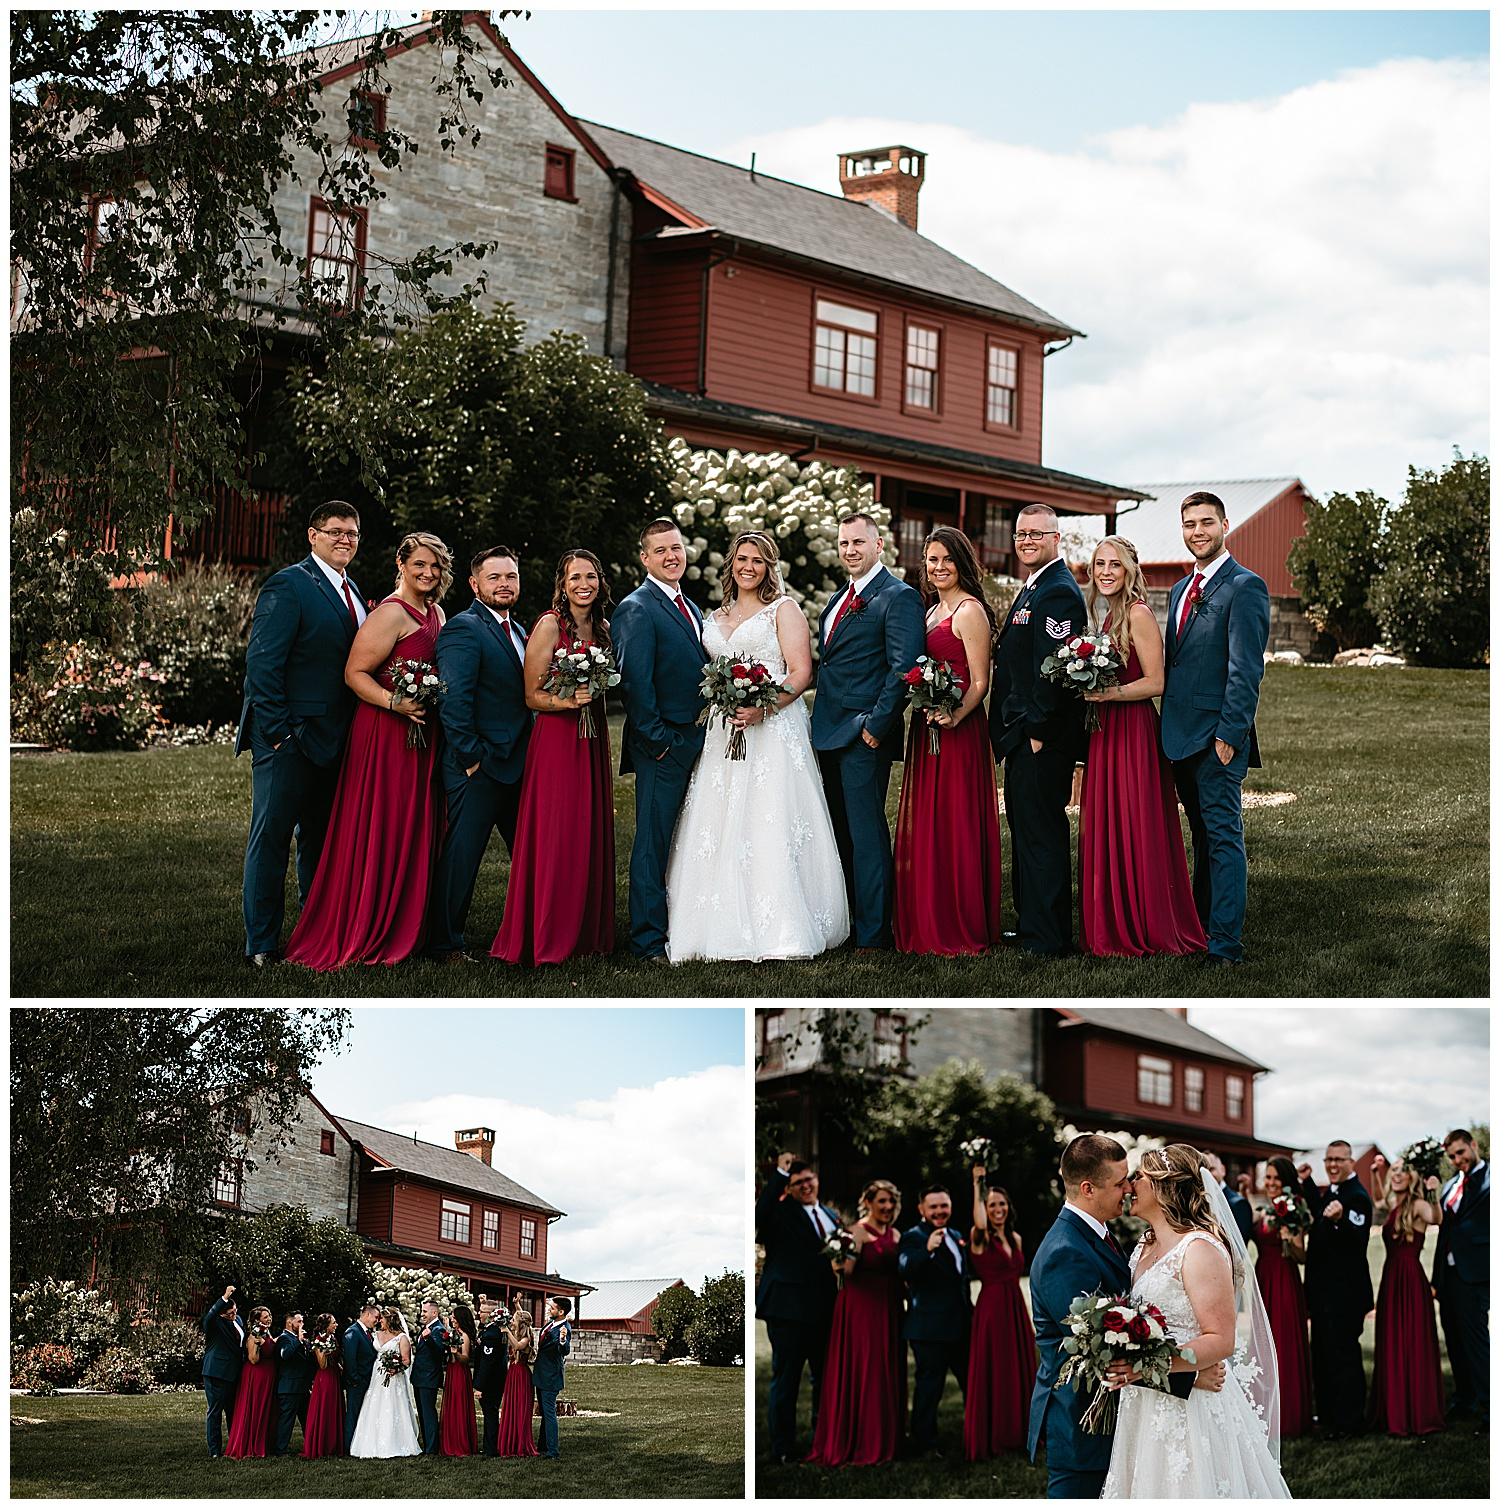 NEPA-Bloomgsburg-Wedding-Photographer-at-The-Barn-at-Greystone-Farms-Watsontown-PA_0047.jpg